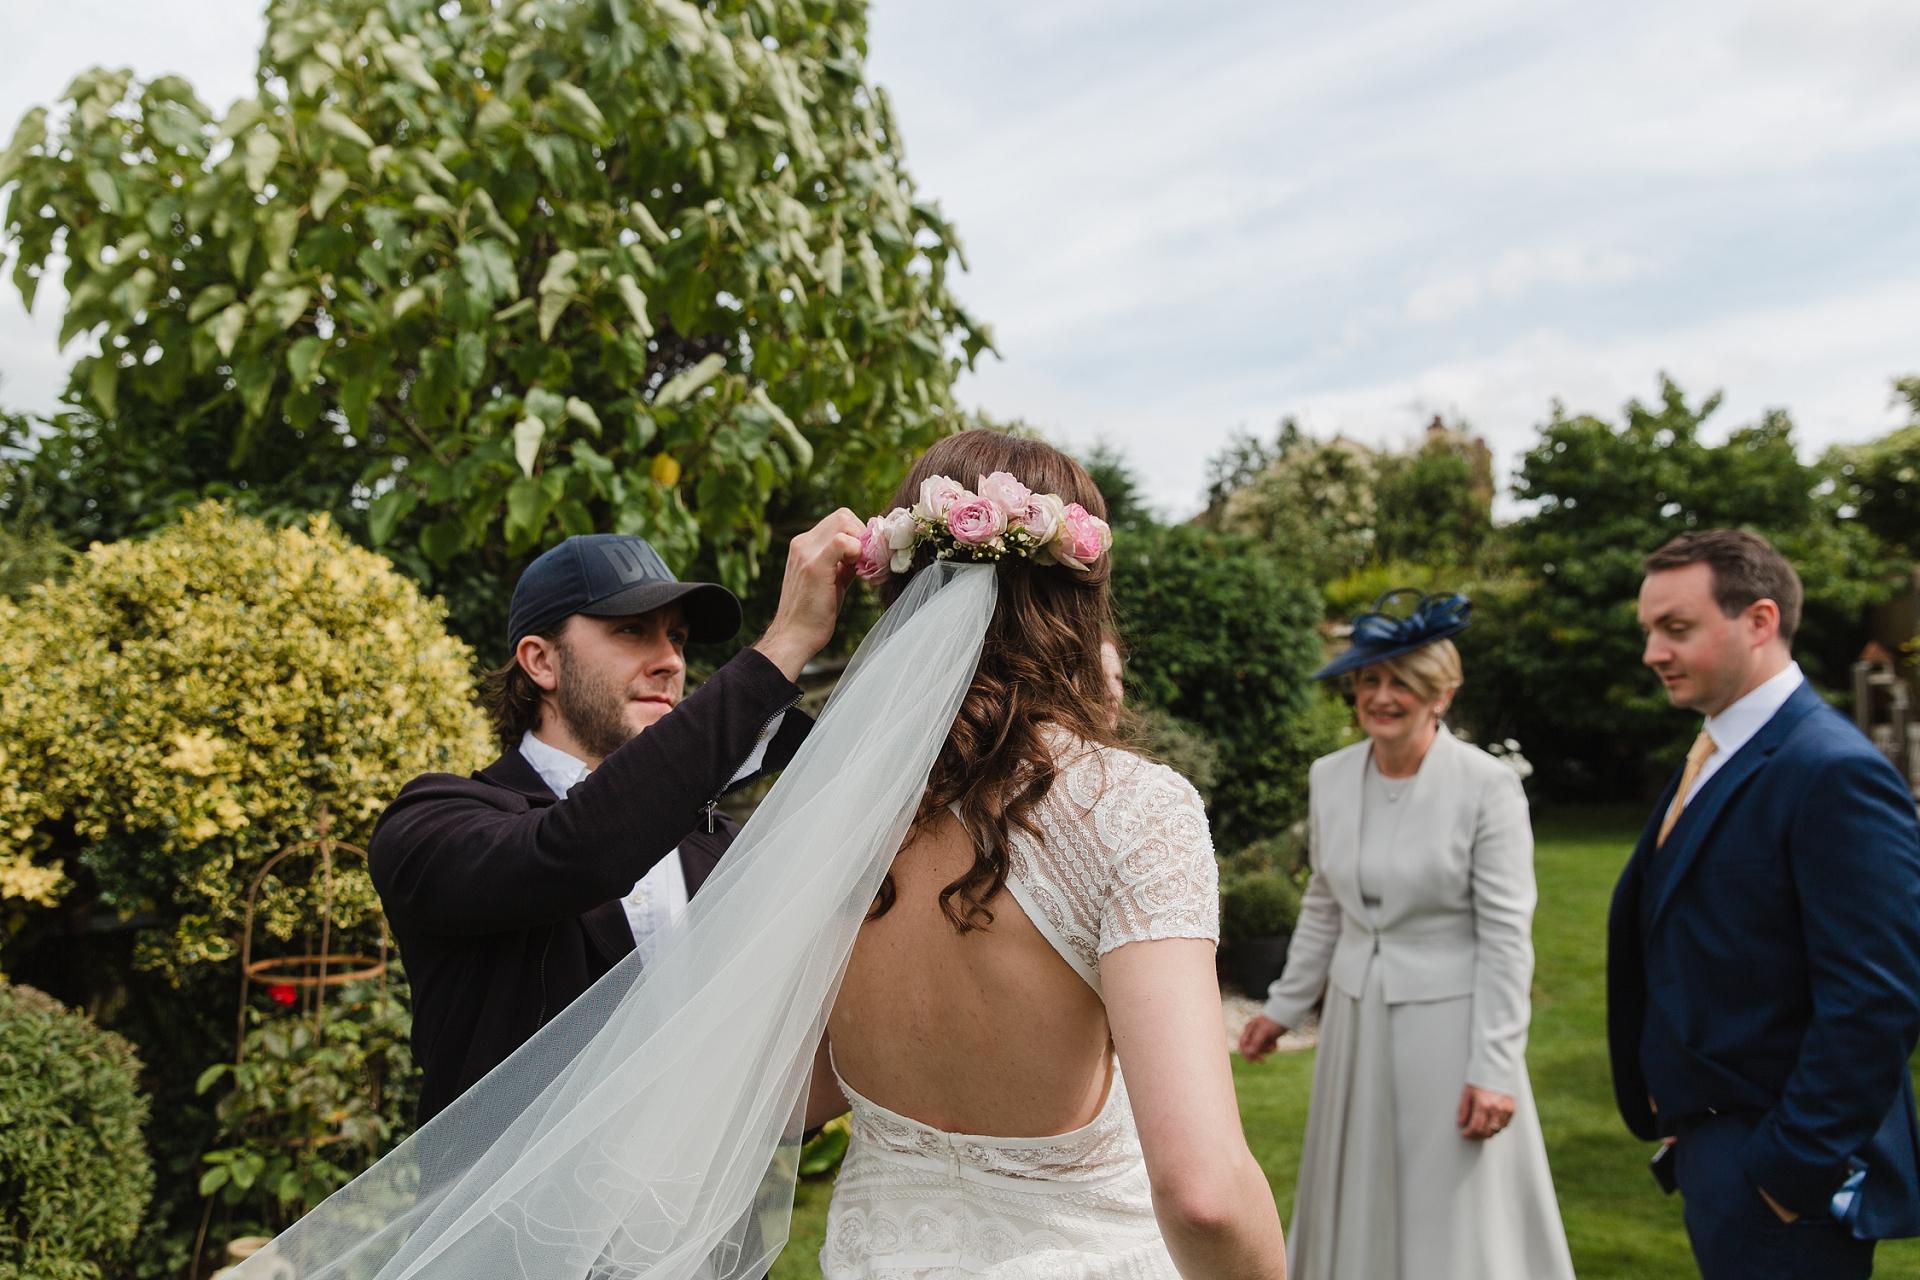 bride putting in veil wedding morning